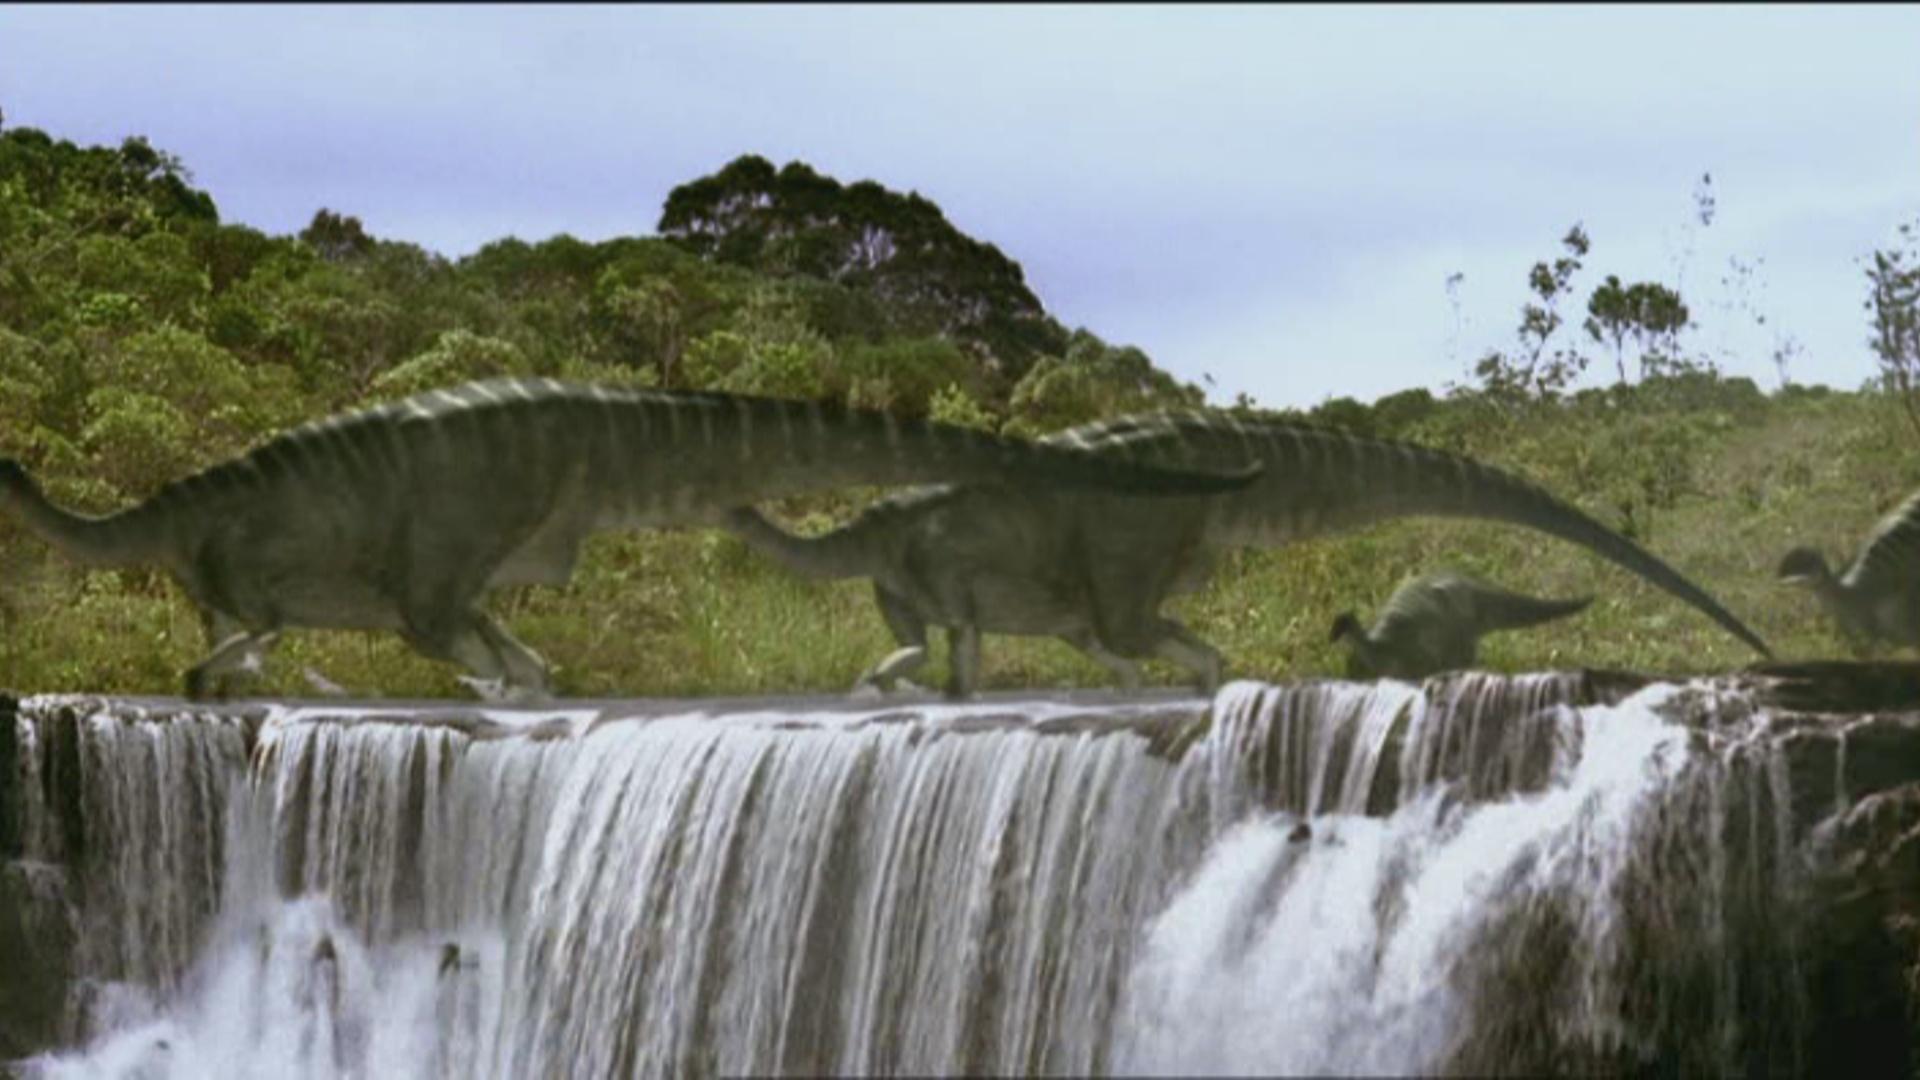 Prosauropods